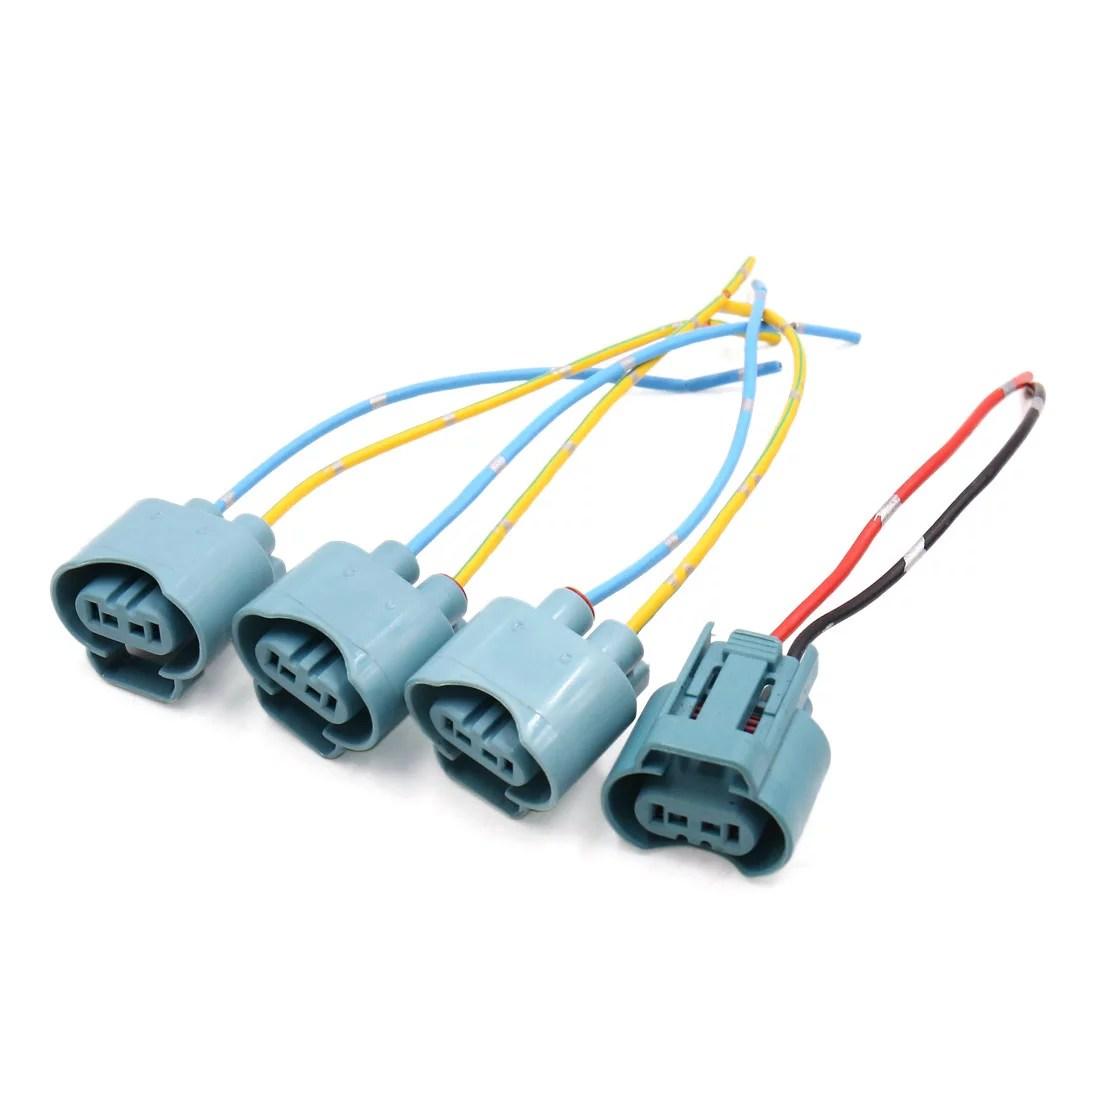 hight resolution of 4pcs 9005 fog light lamp bulb socket wiring harness connector holder for car walmart com